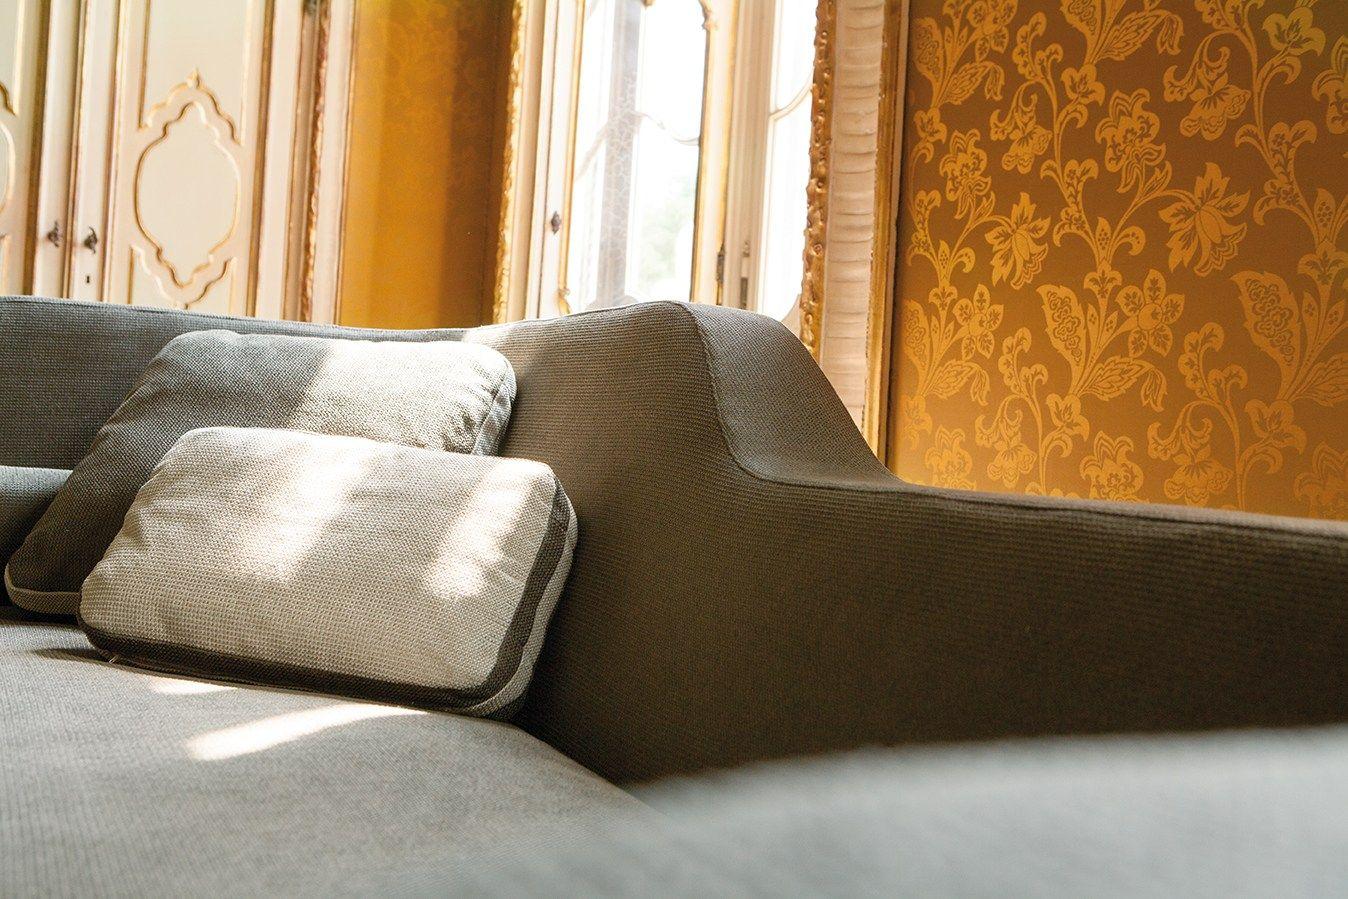 sofa jeremie by milano bedding design eric berth s. Black Bedroom Furniture Sets. Home Design Ideas